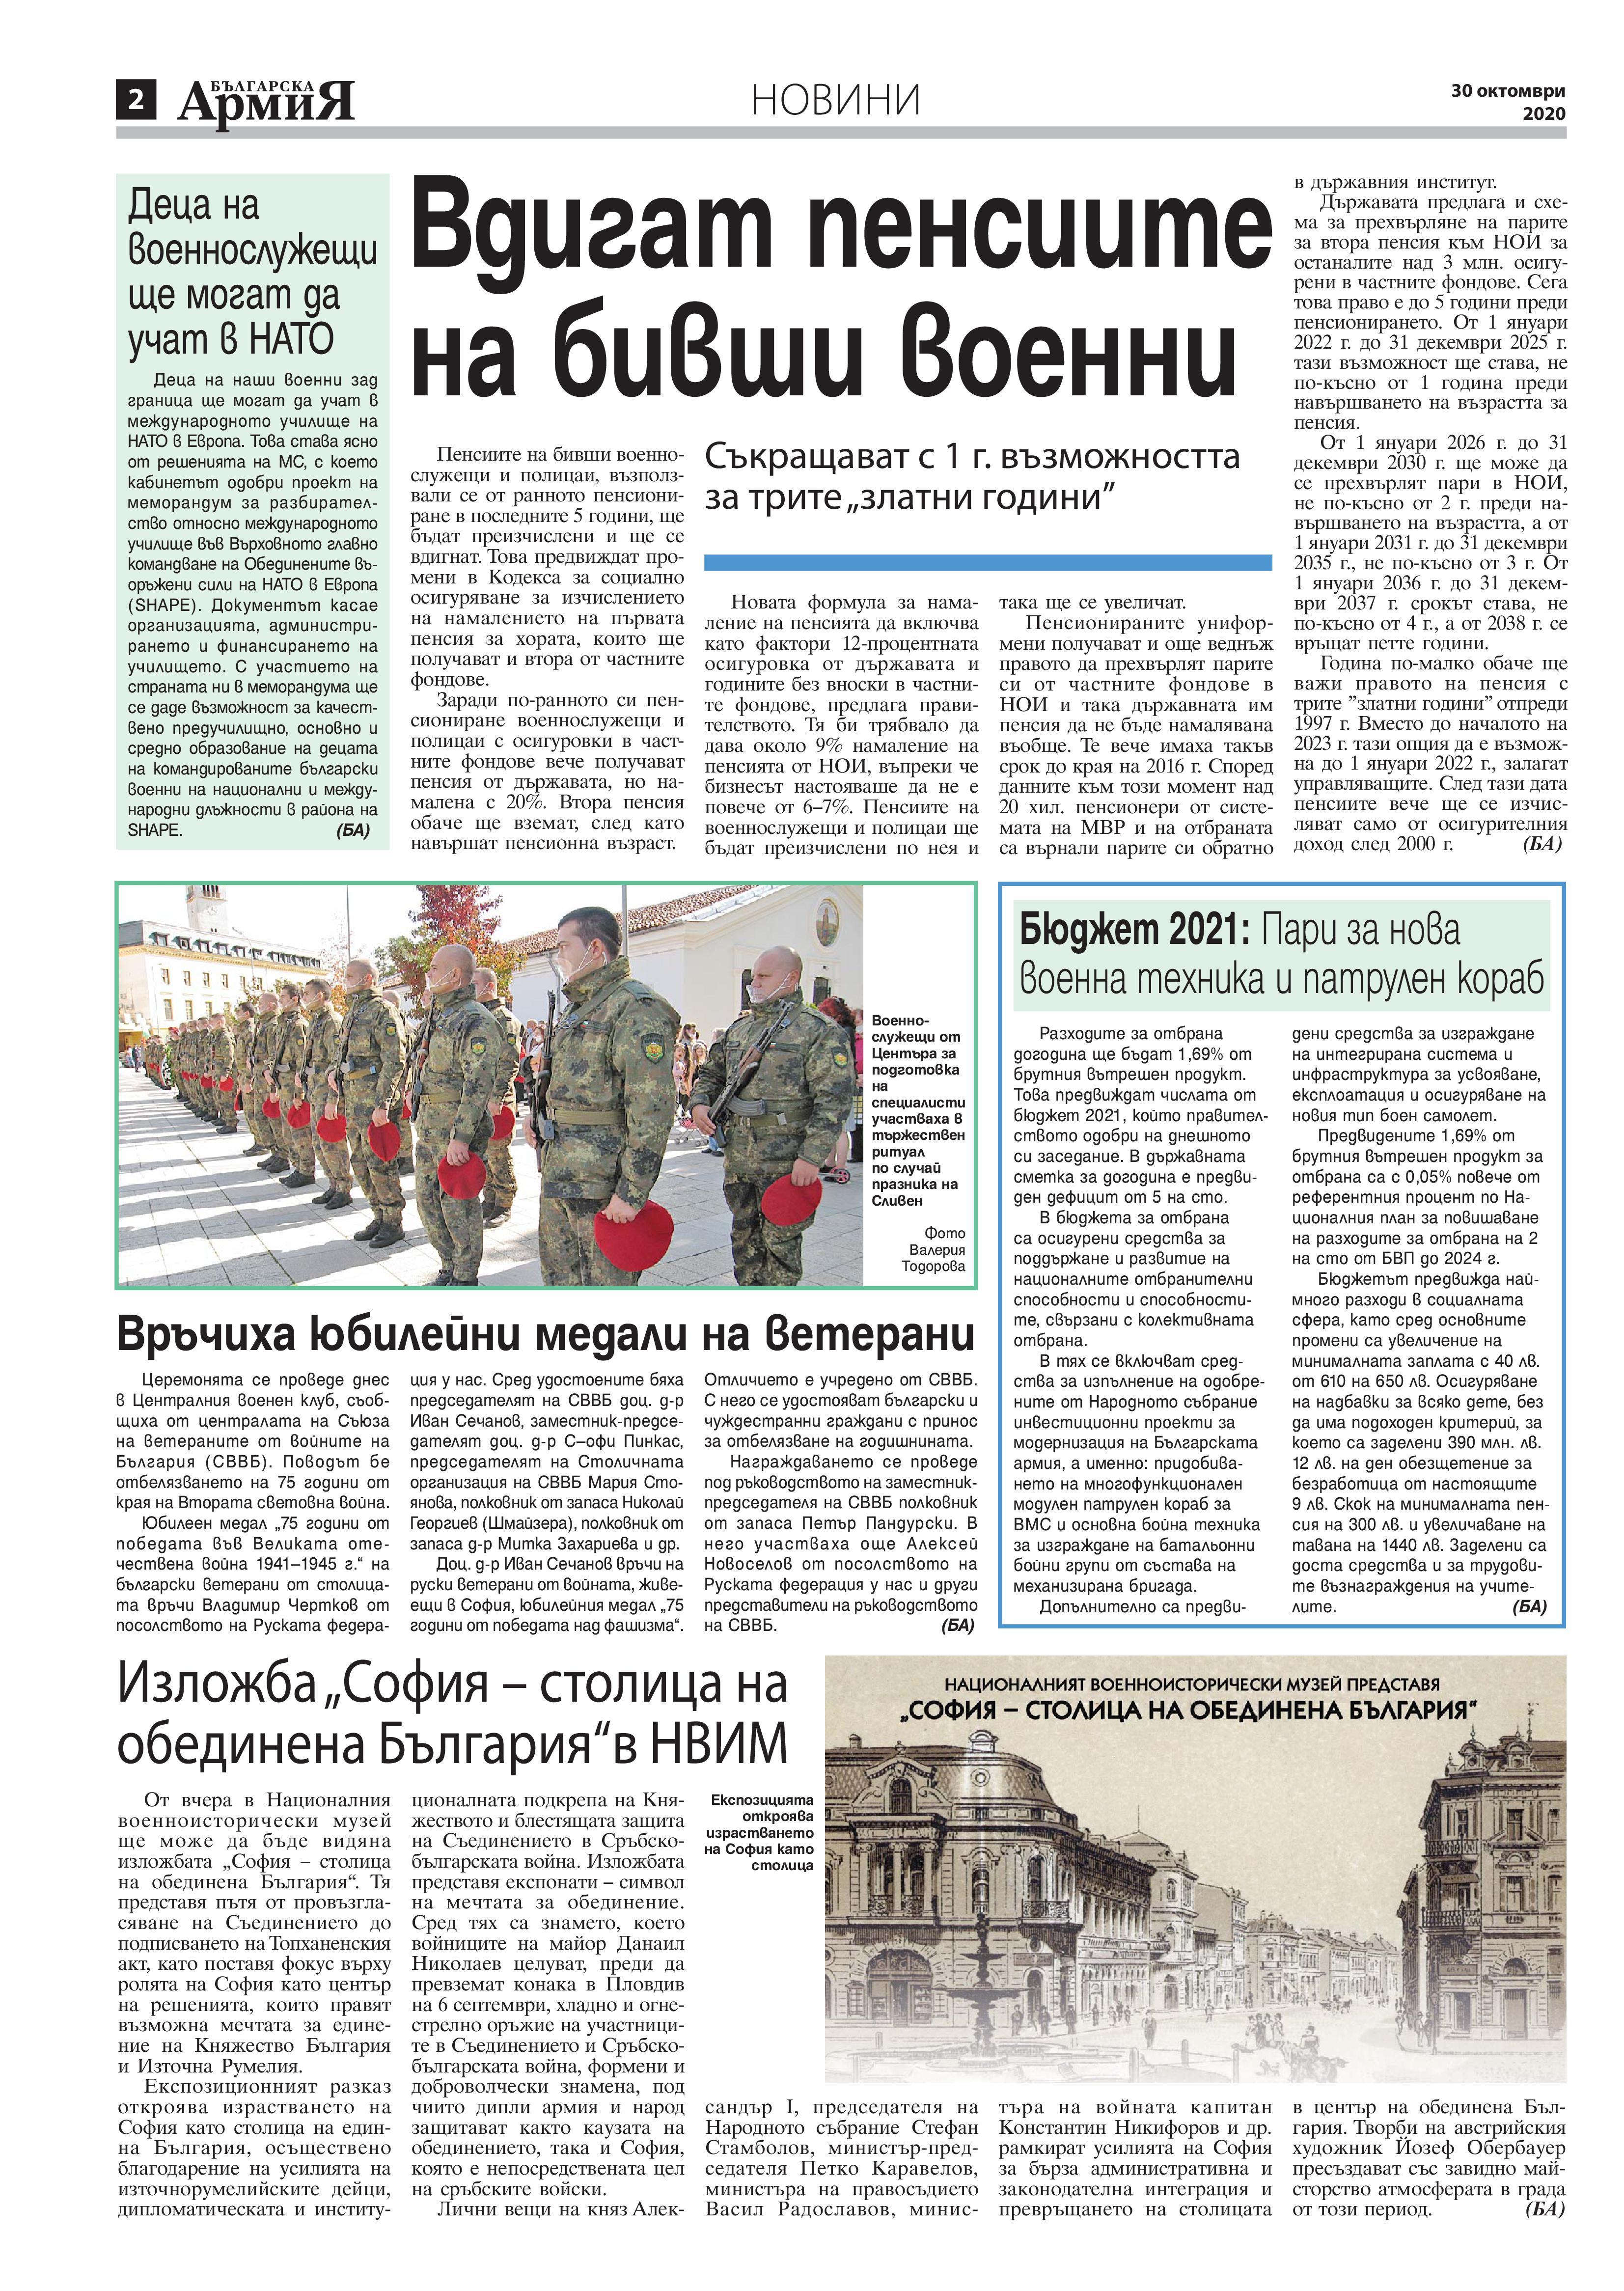 https://armymedia.bg/wp-content/uploads/2015/06/02-45.jpg